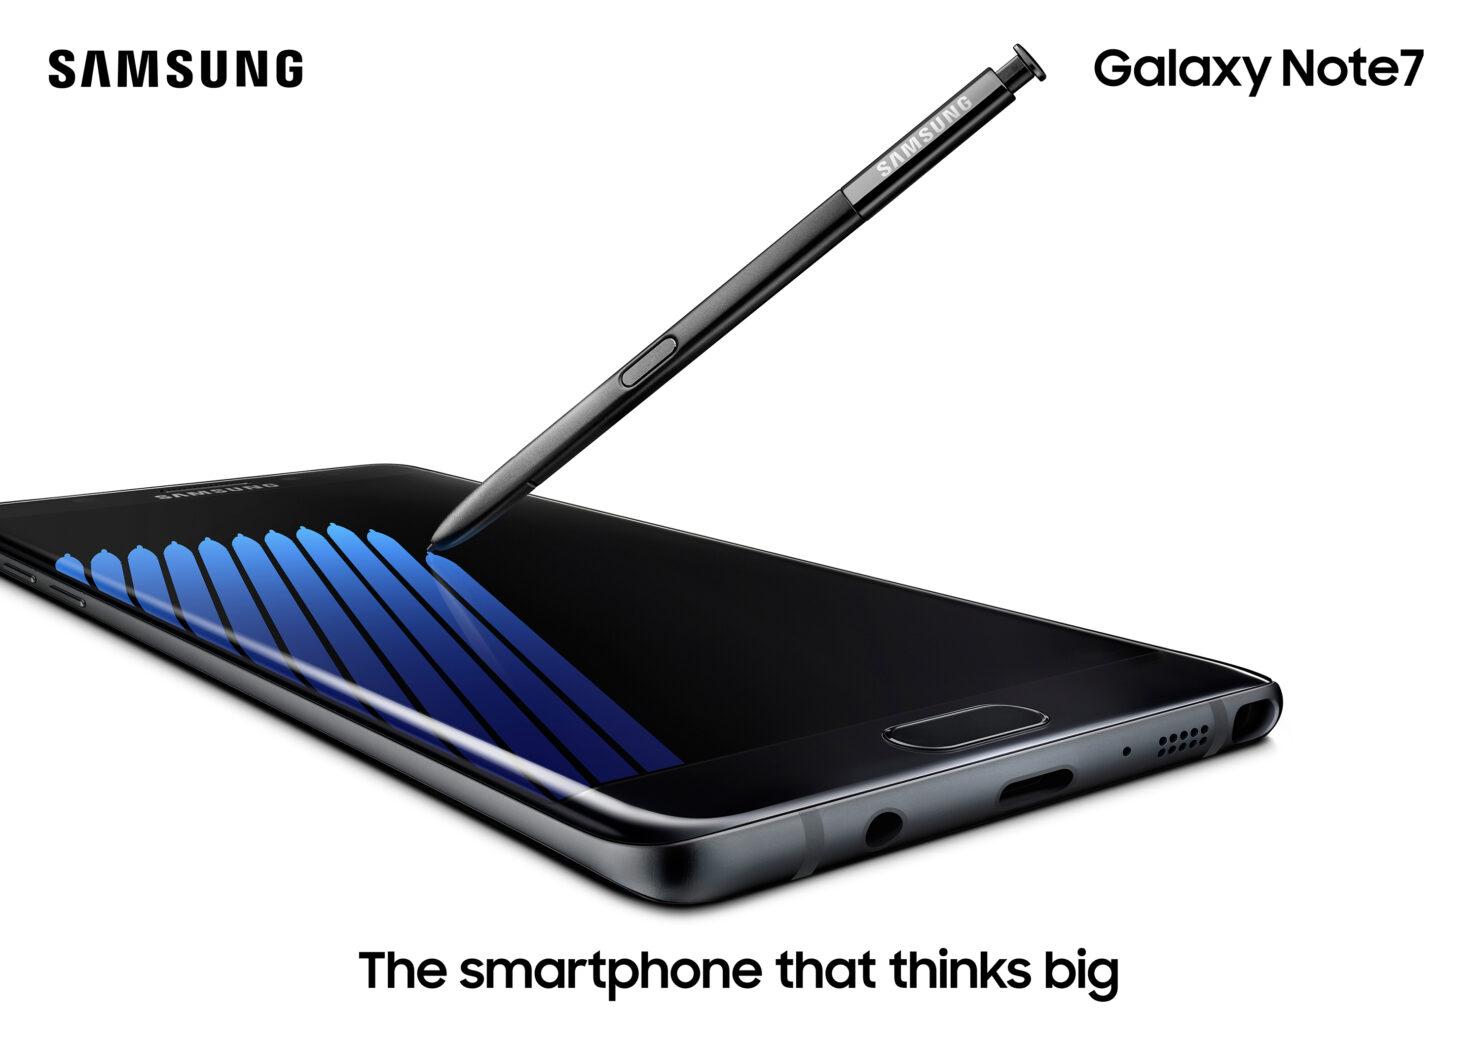 galaxy-note7-key-visual-note7_black_28102355554_o-2